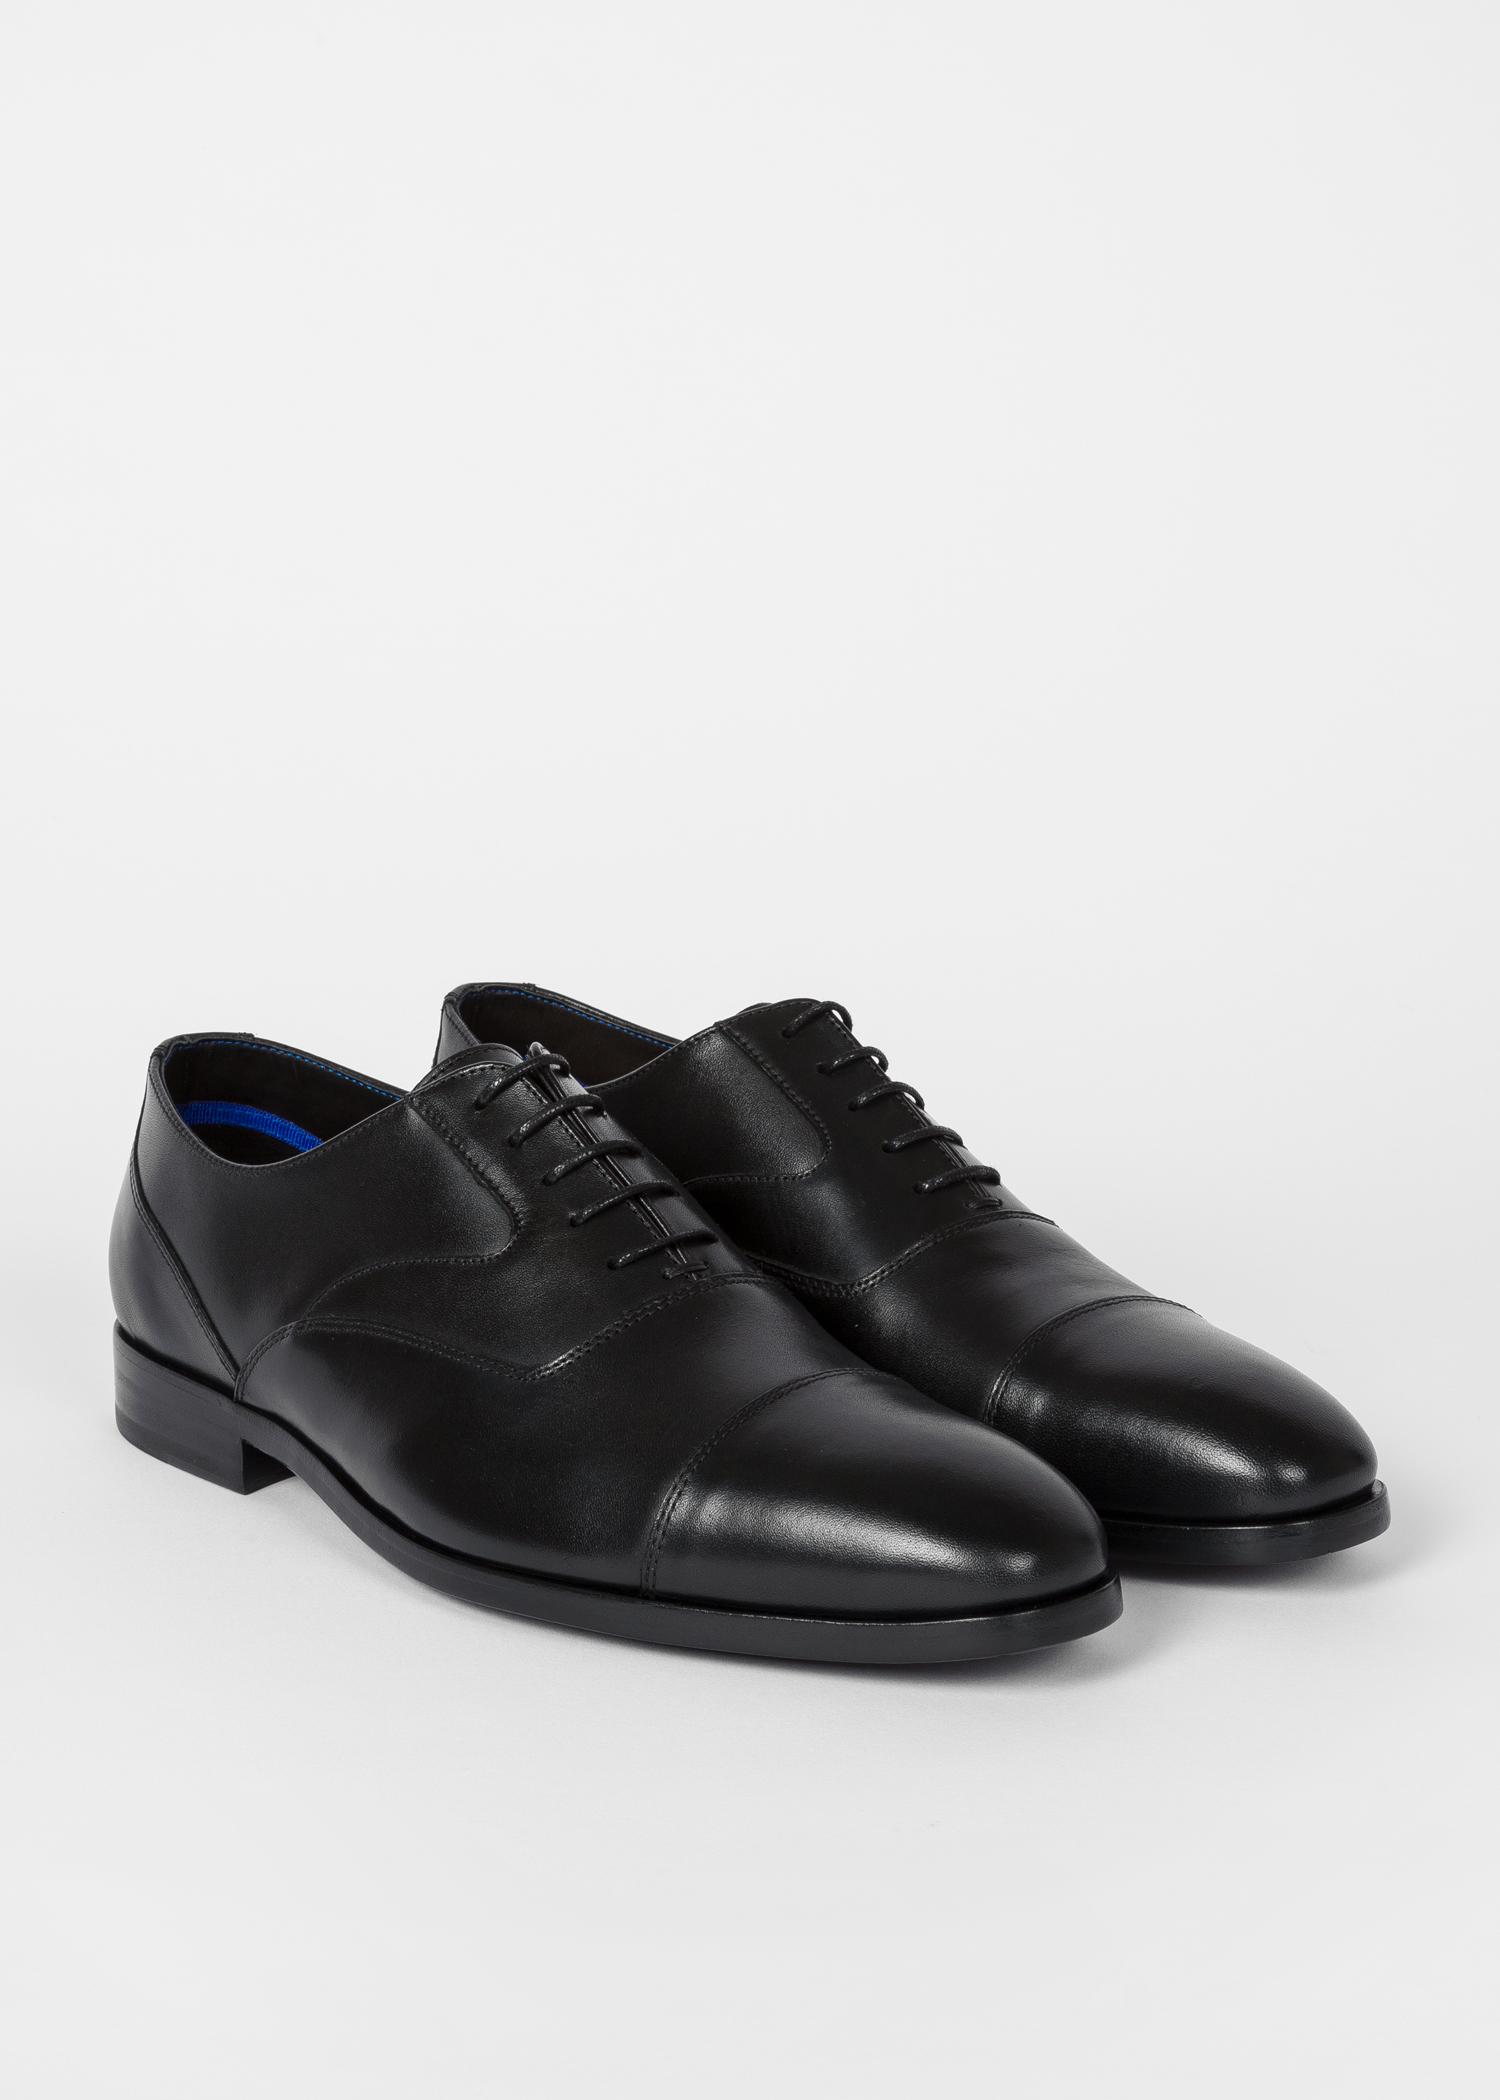 Black Paul Shoes Oxford Smith Men's Leather 'tompkins' EYbDH2eW9I